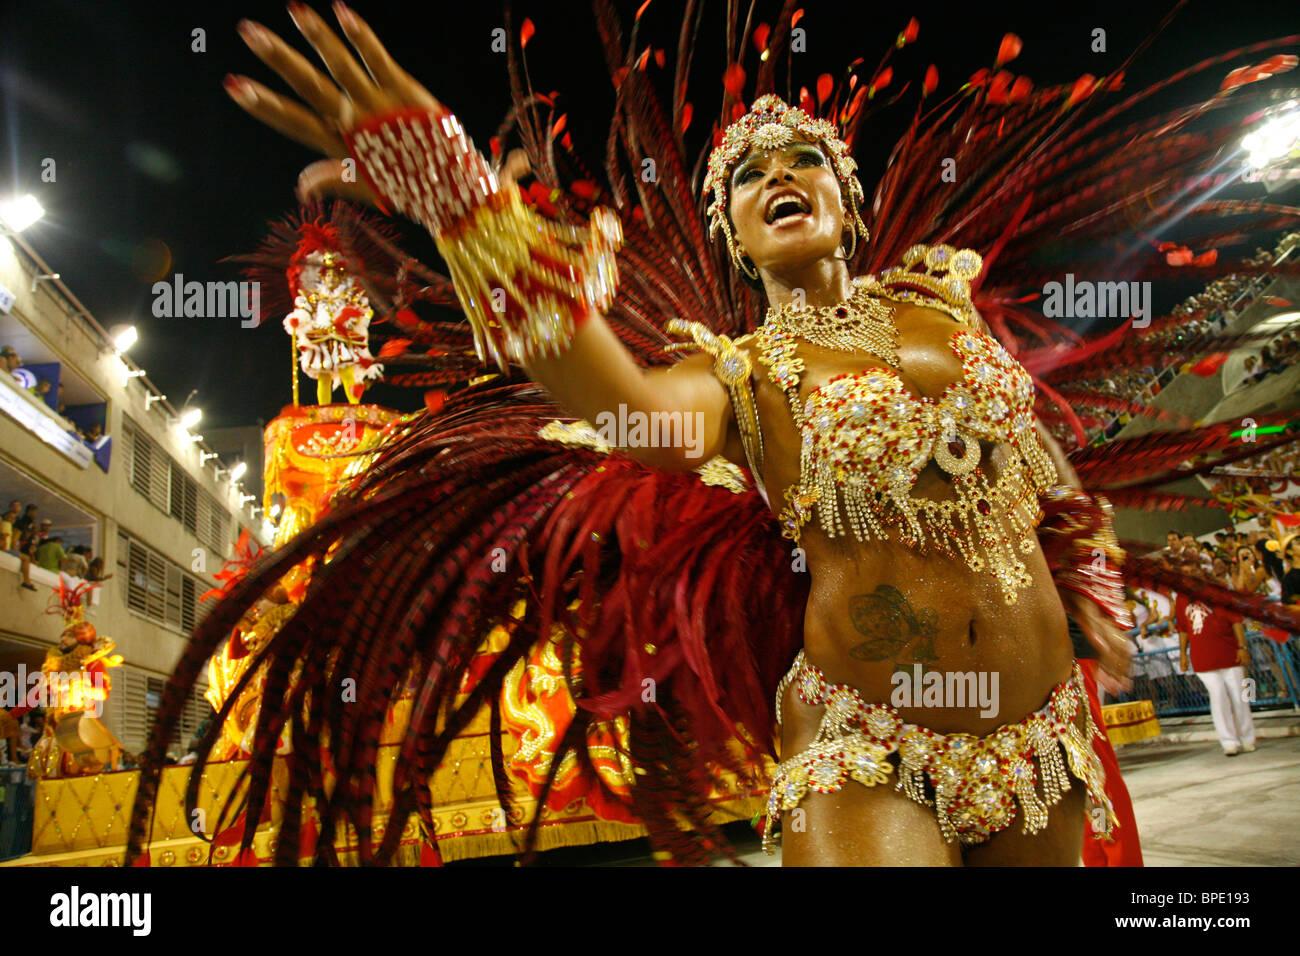 Carnival parade at the Sambodrome, 2010, rio de janeiro, Brazil. - Stock Image